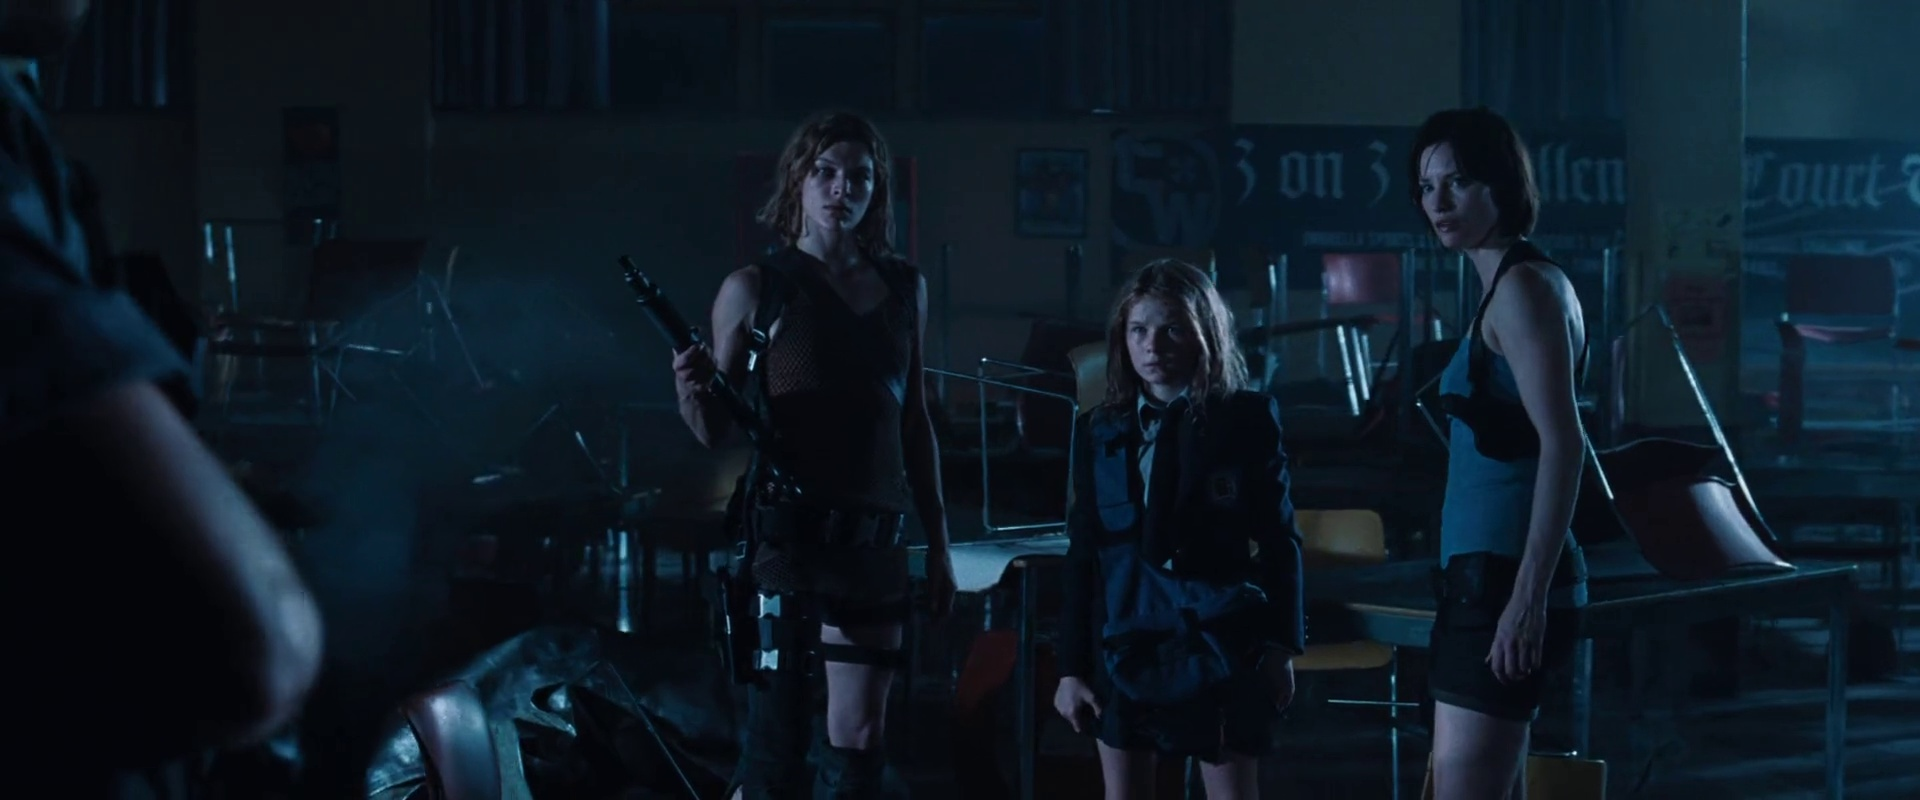 Galerie Resident Evil: Apocalypse 7